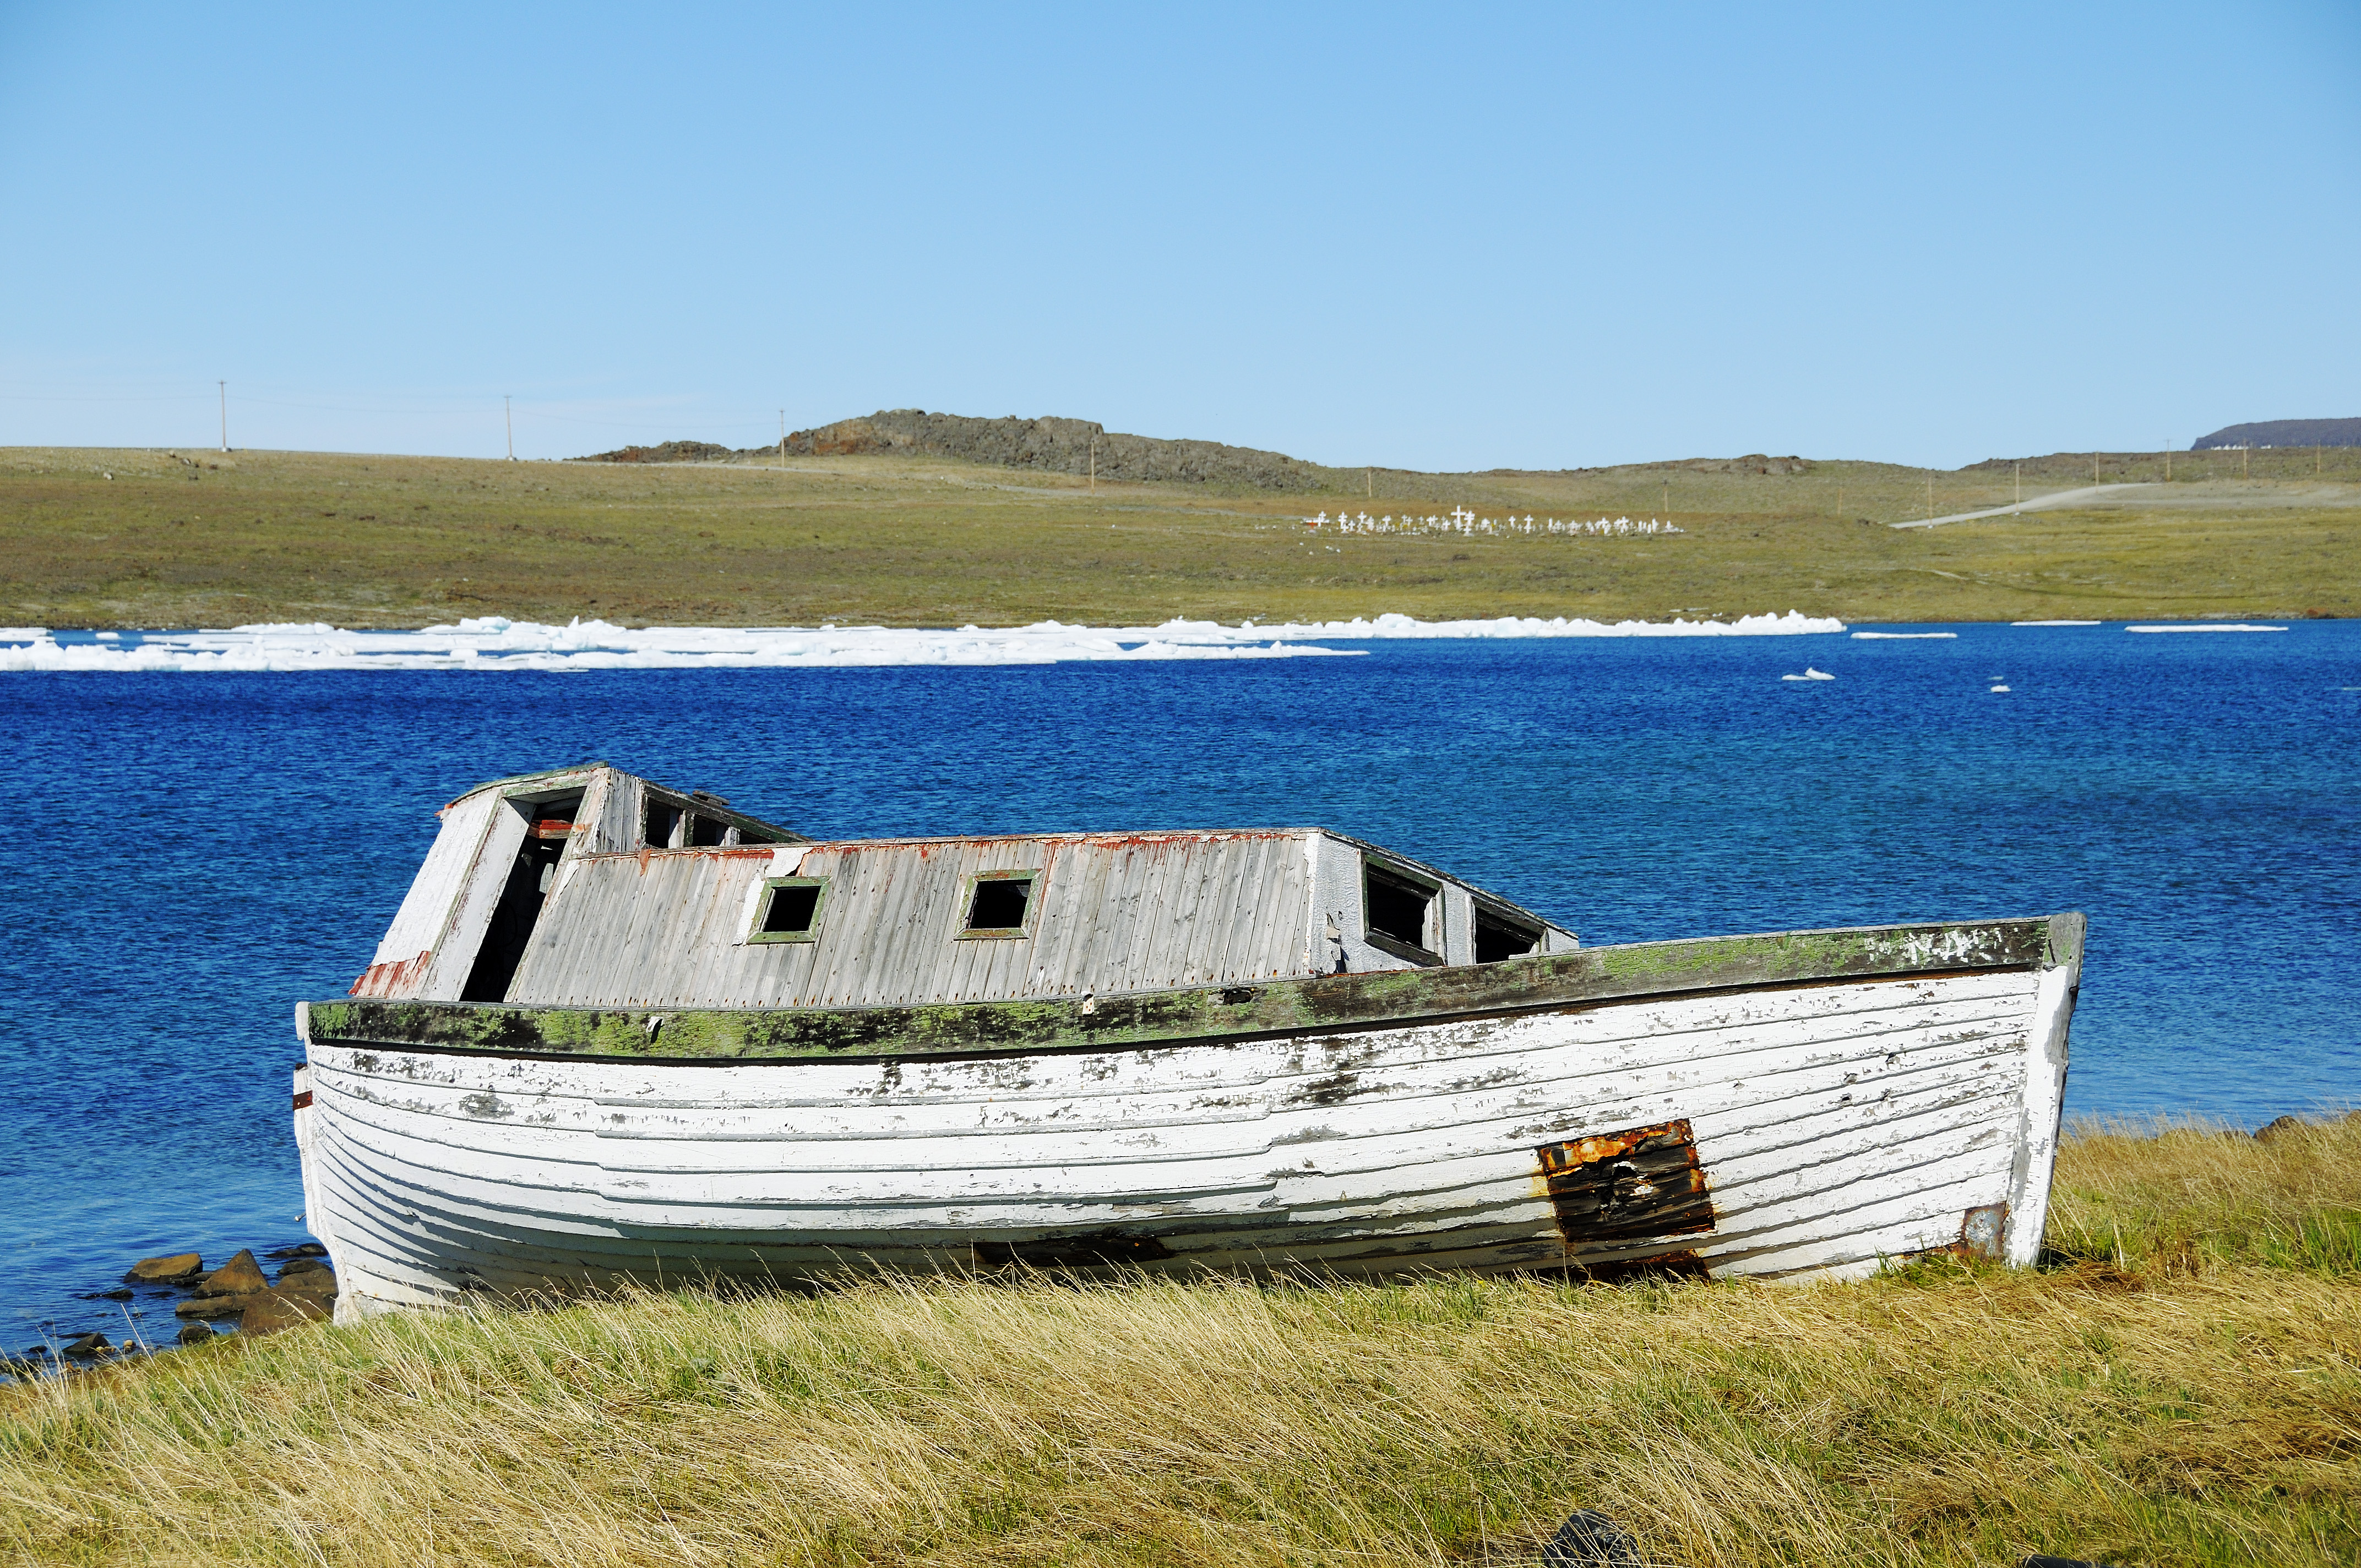 Altes Holz-Boot am Ufer der Beaufort Sea, Nordpolarmeer, Victoria Island (vorher Holman Island), Dorf Ulukhaktok, Northwest Territories, Kanada, Amerika